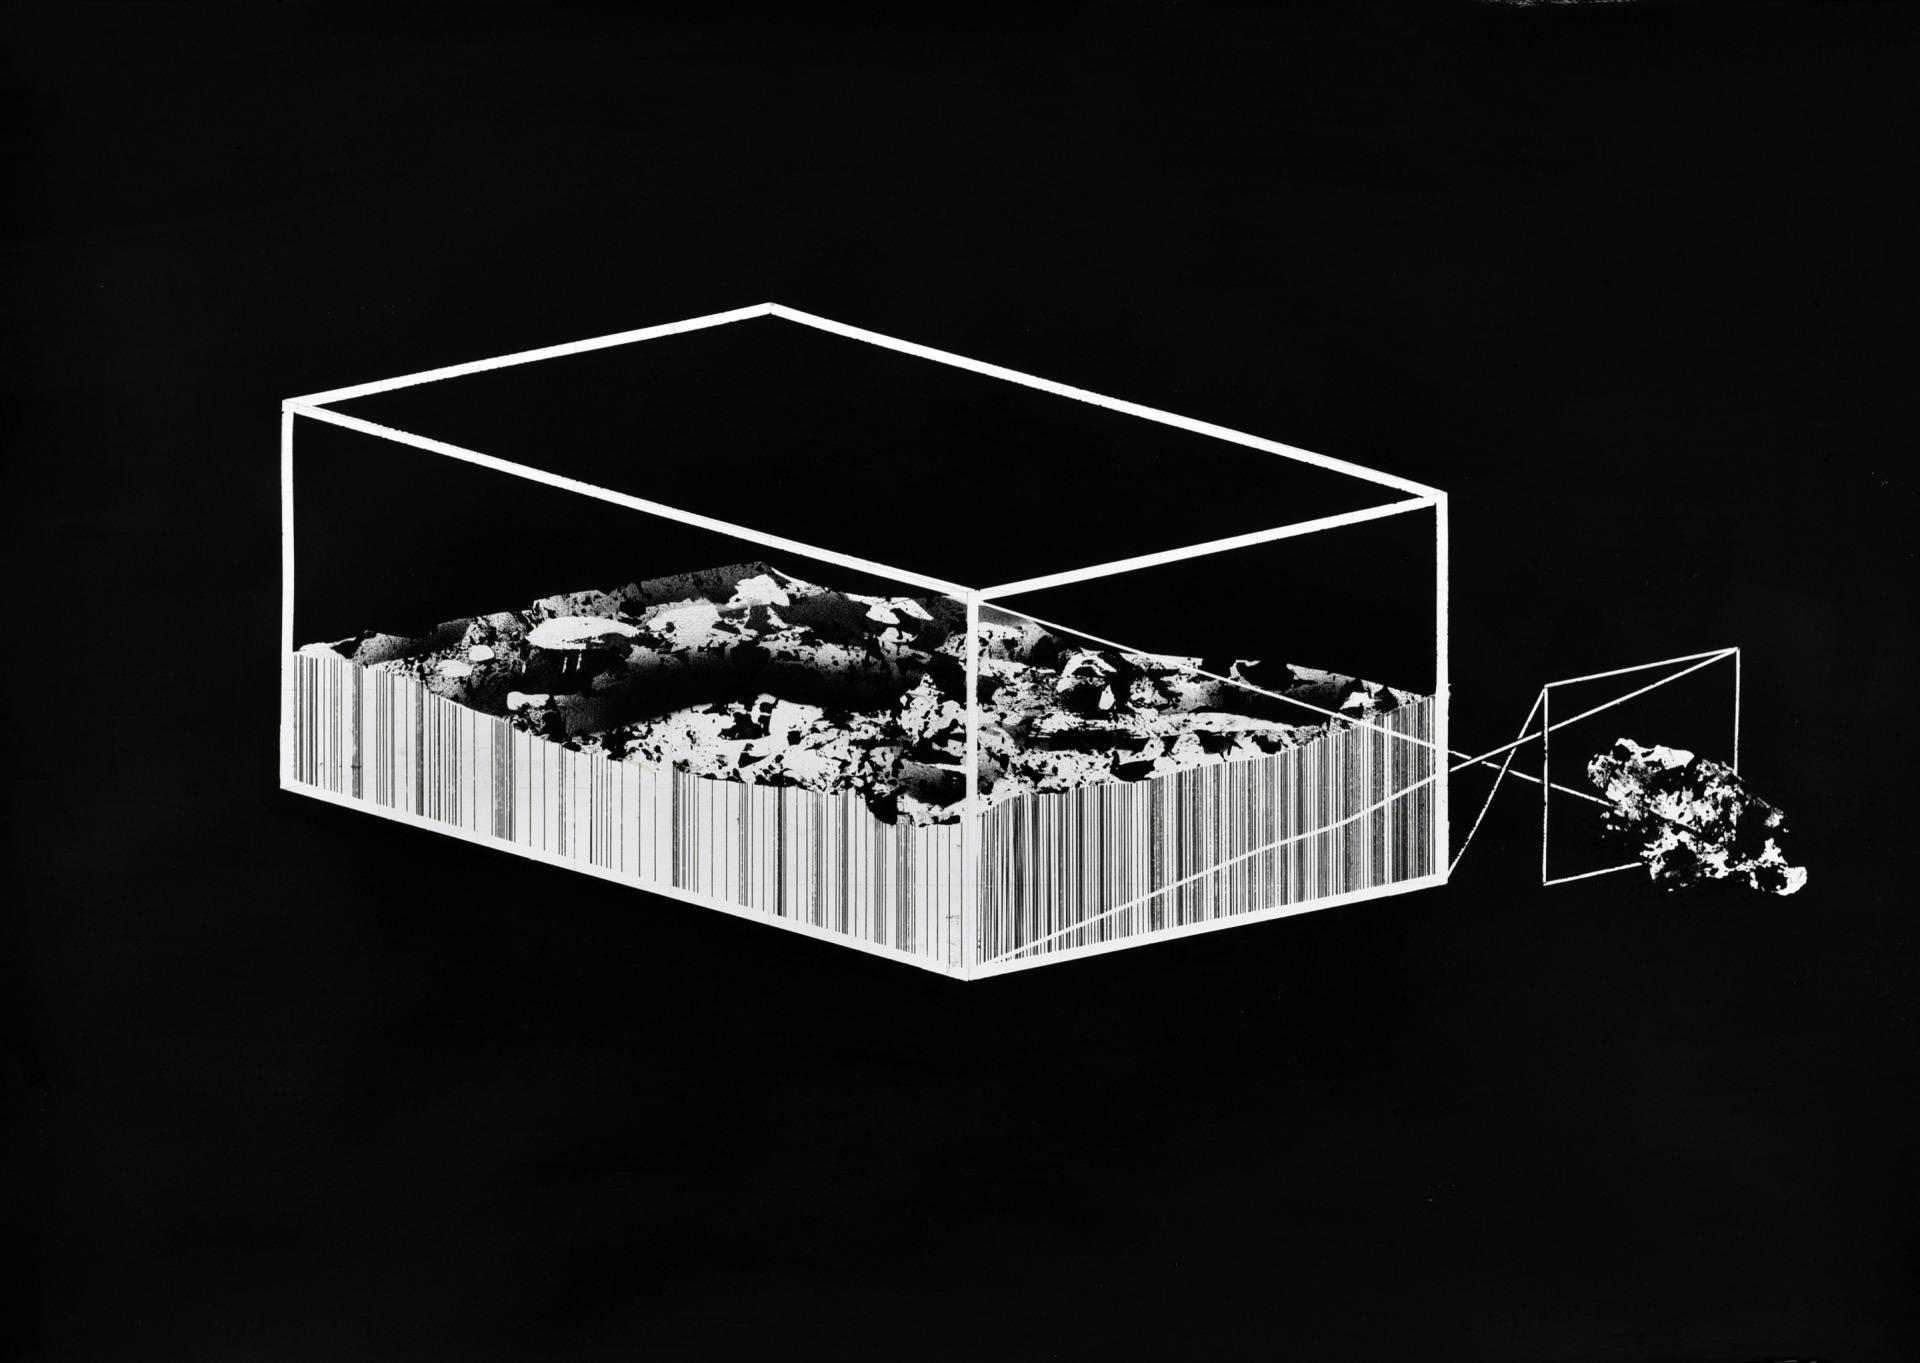 Contemporary art from Gyula Sági | op180321. 1